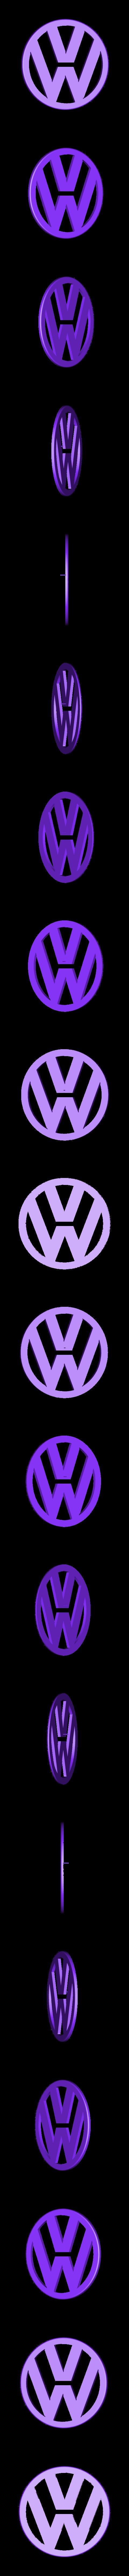 Volkswagen_logo.stl Download free STL file Mercedes Benz and Volkswagen keychain • 3D printable model, Jakwit